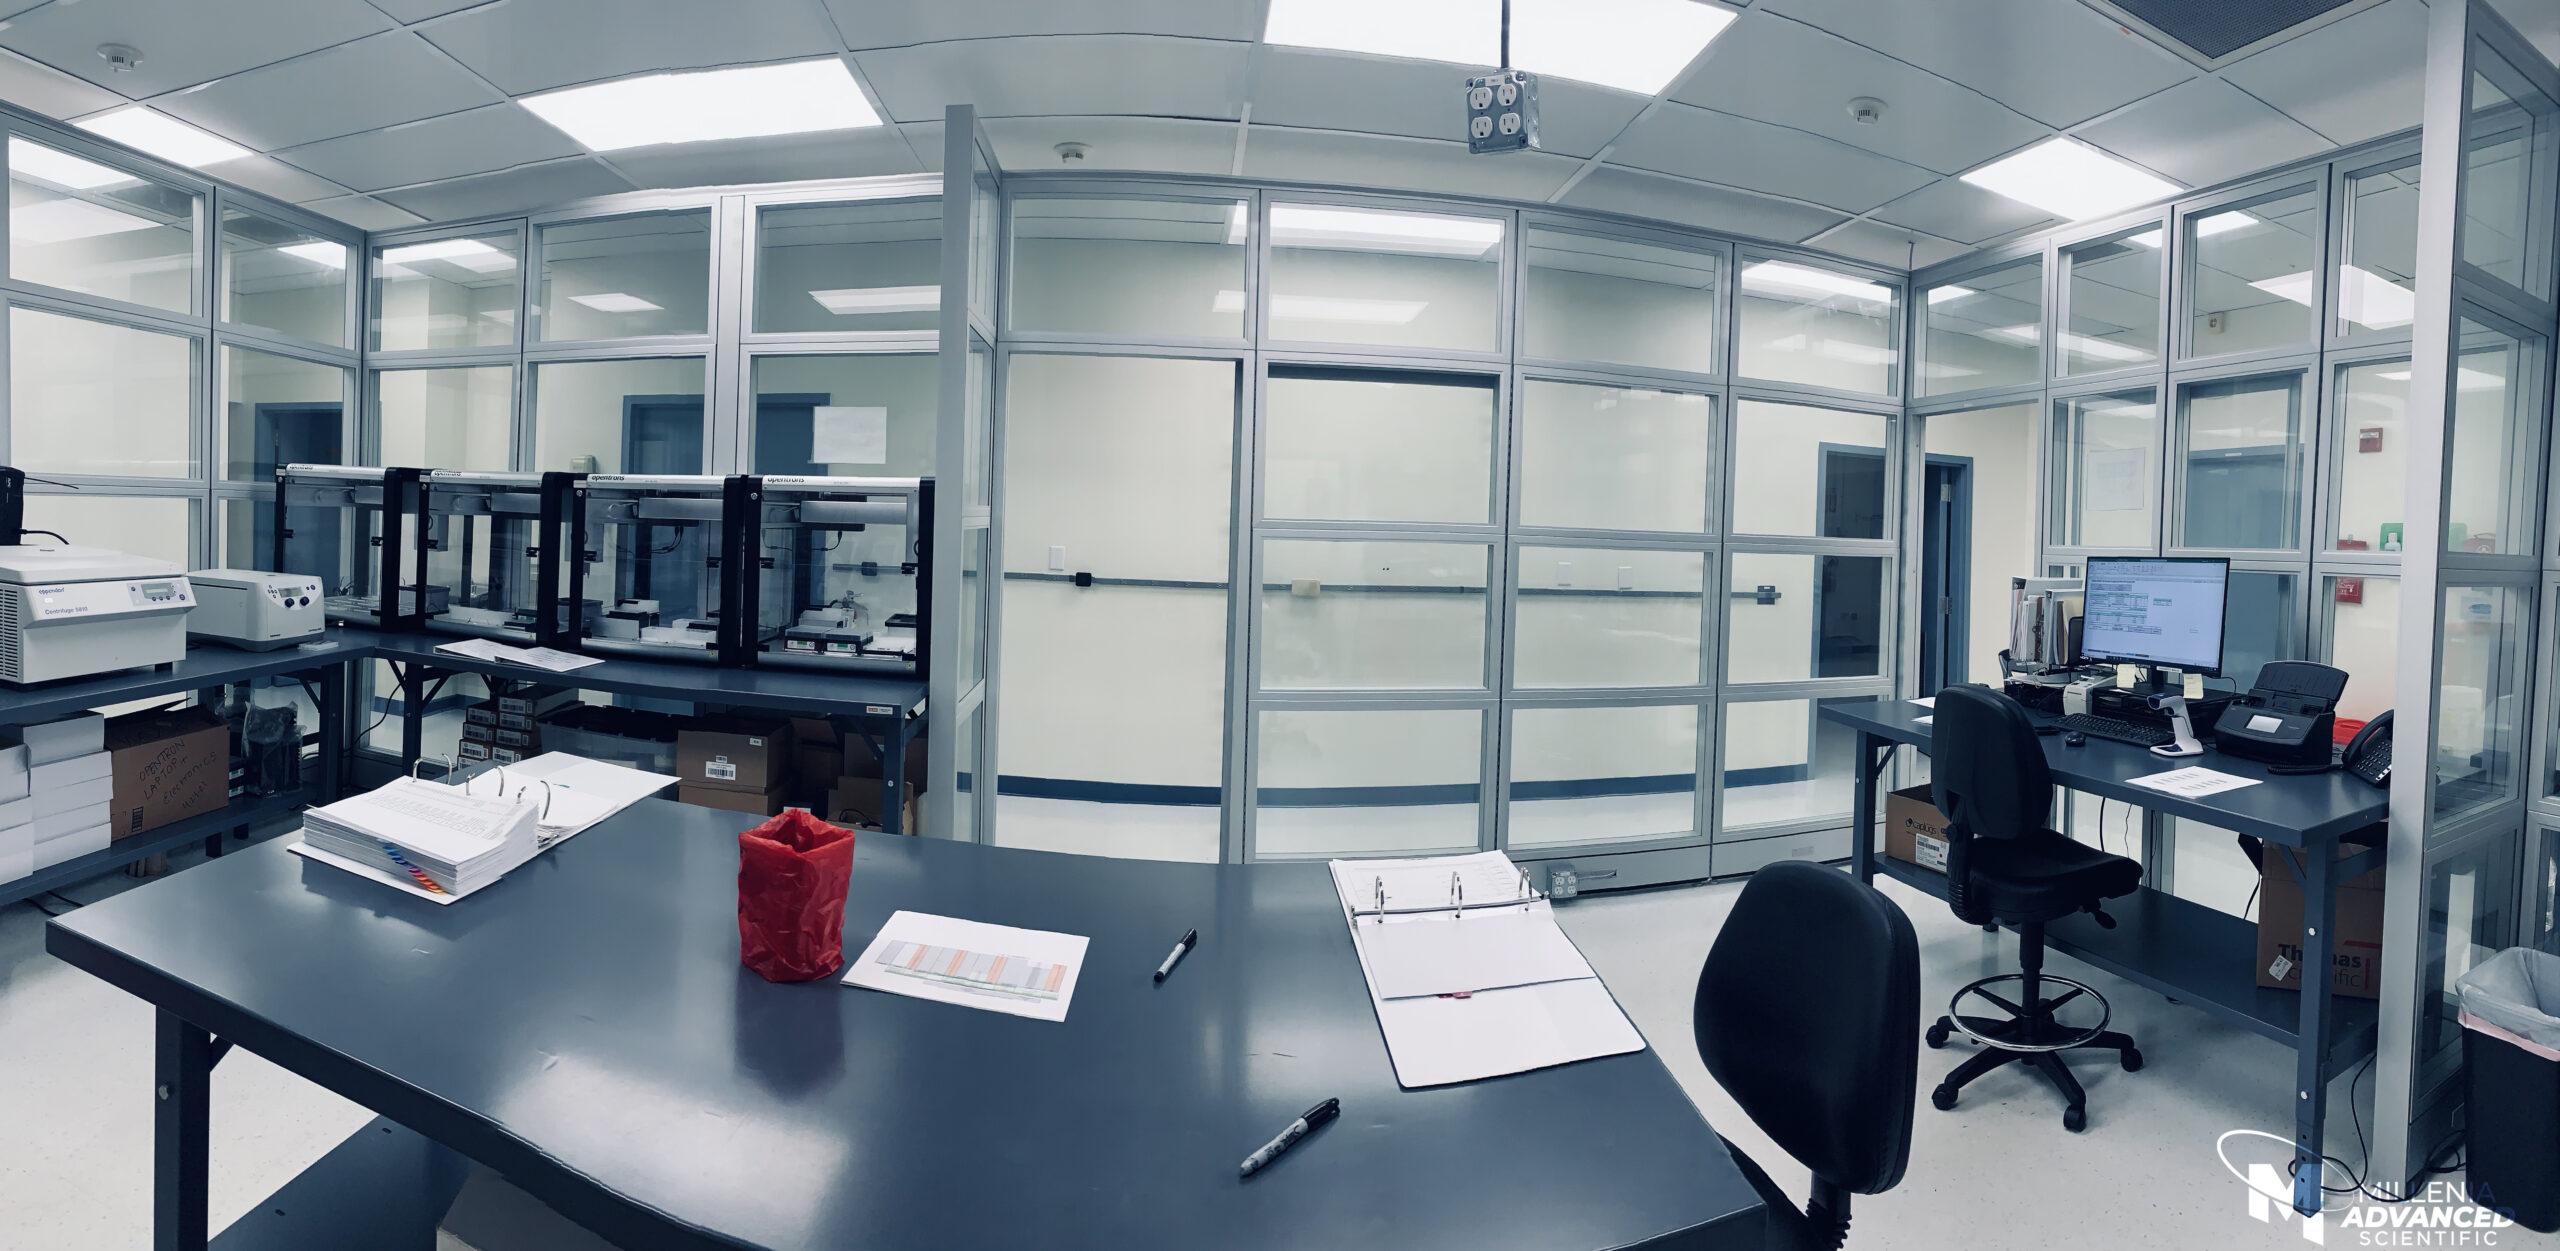 Inside of lab - Covid-19 testing in Orlando